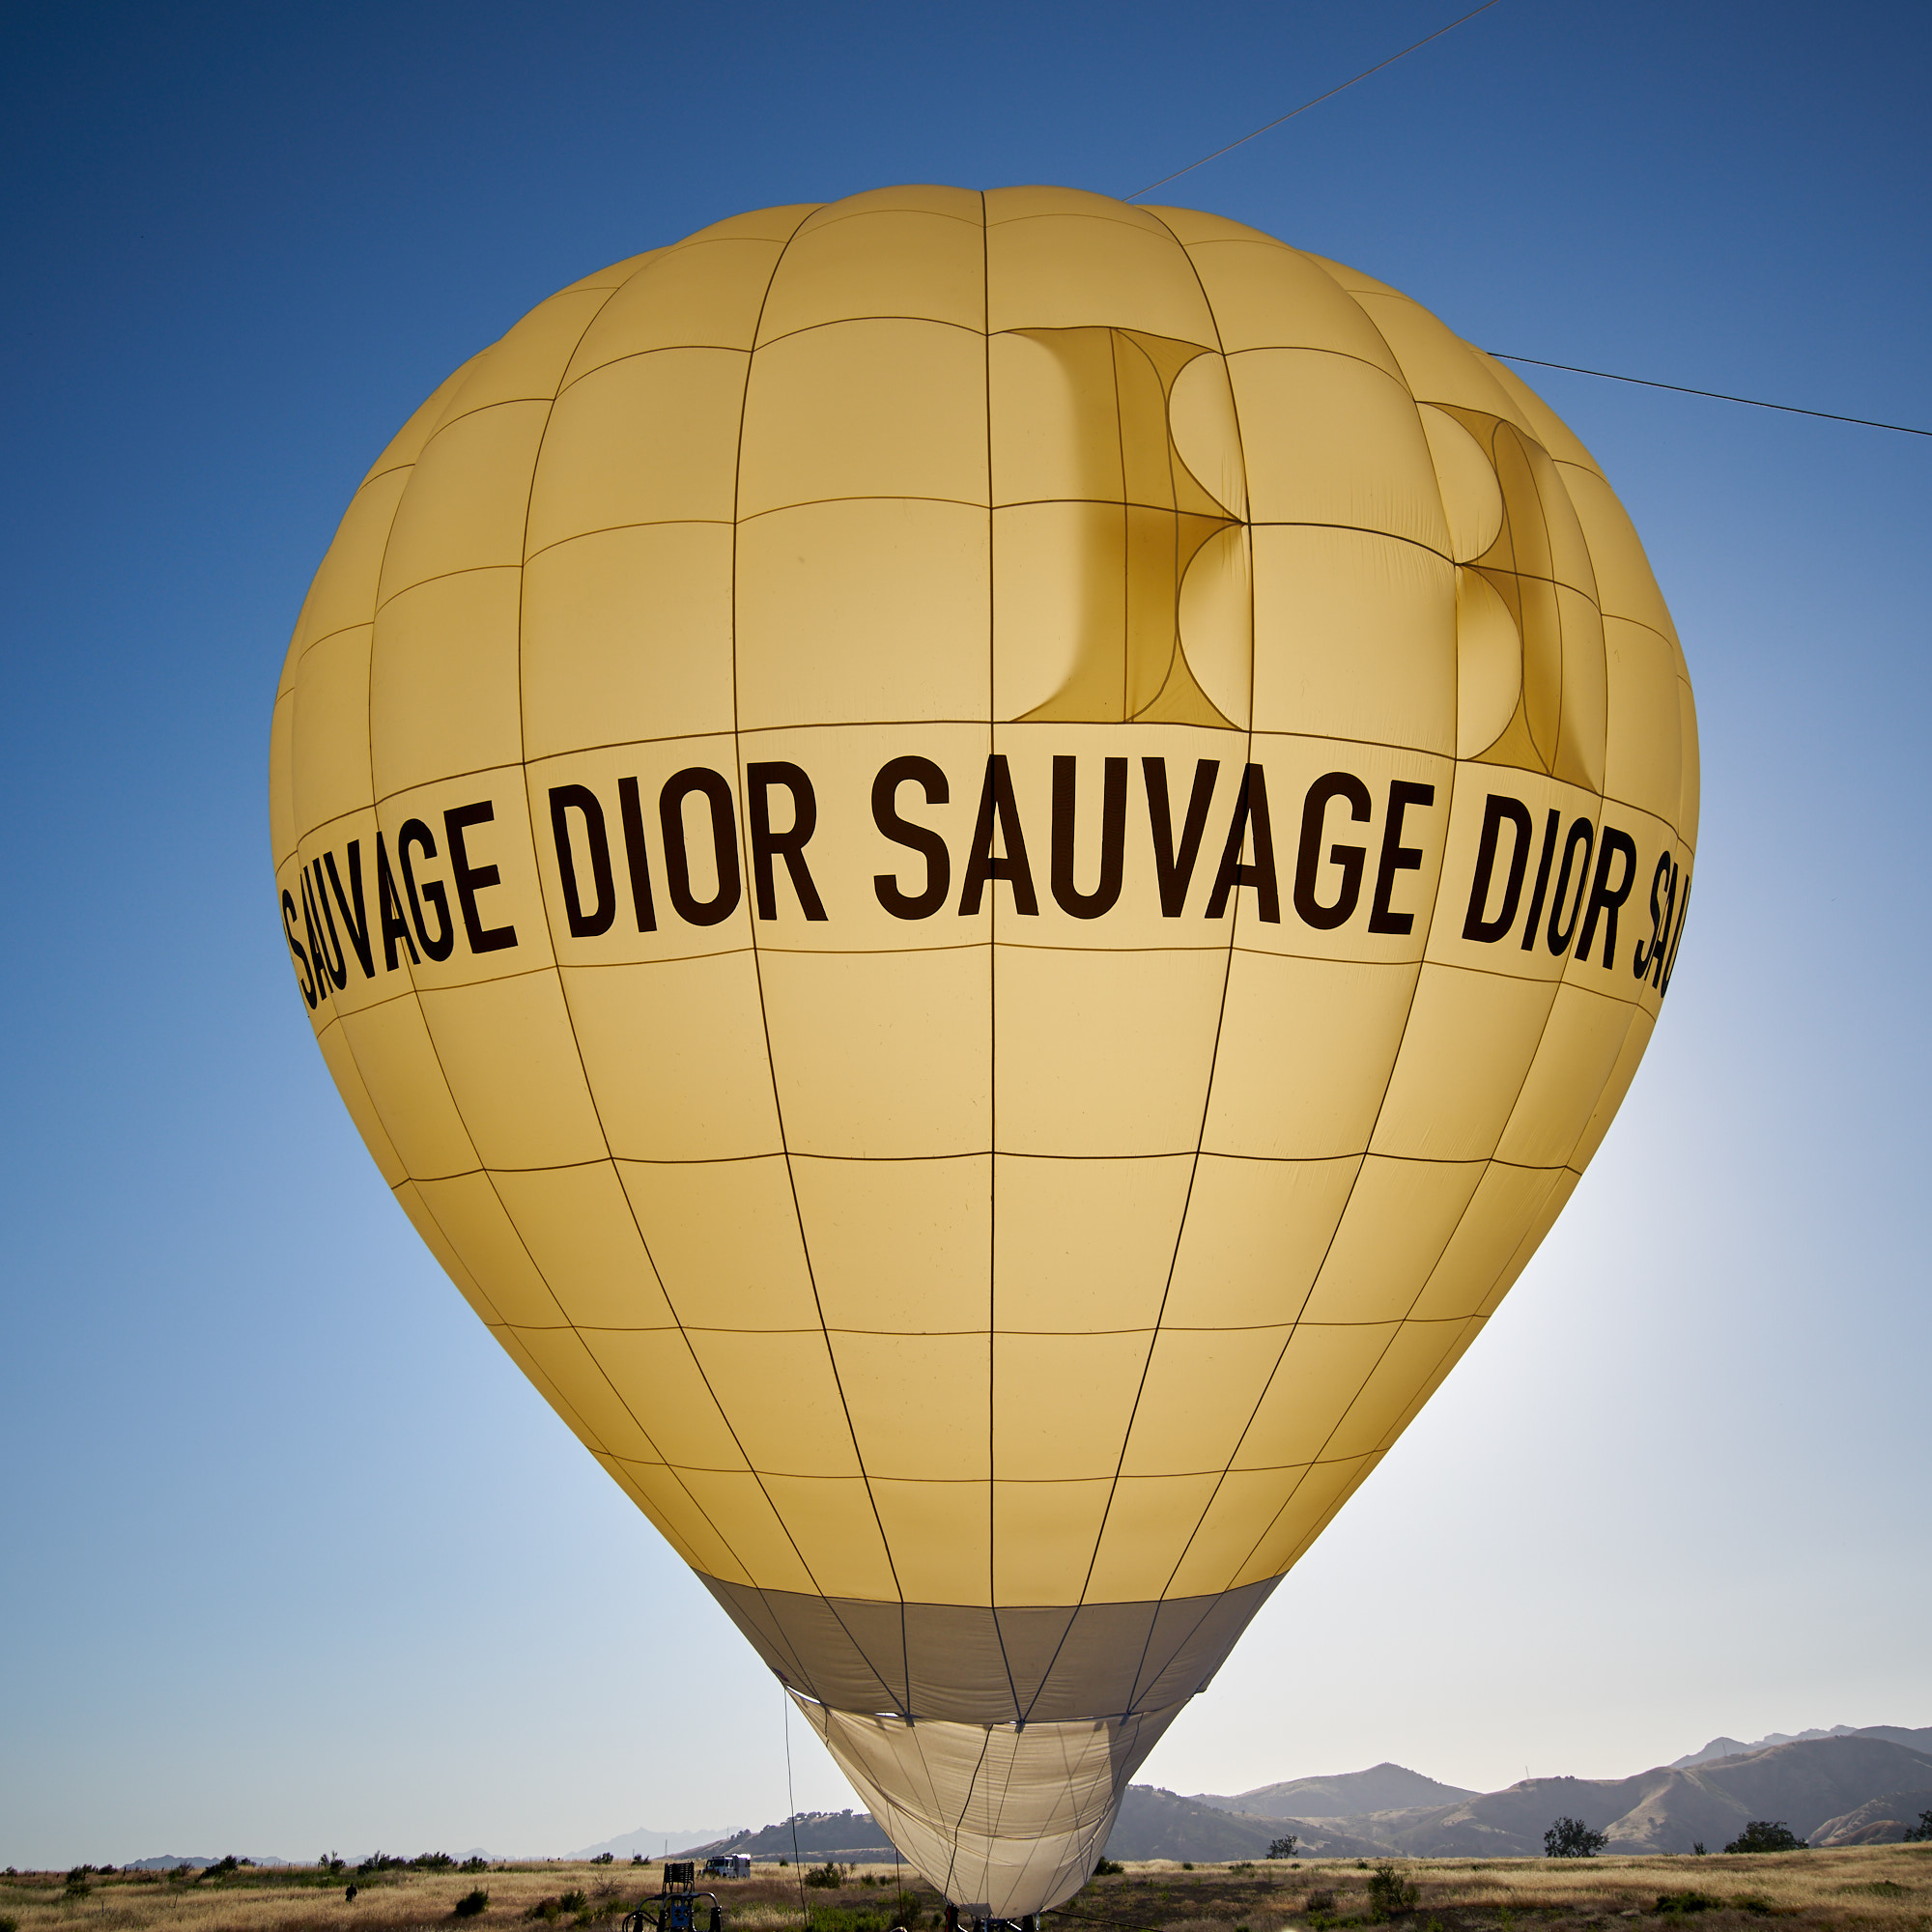 Dior_Cruise_2018_SCENOGRAPHY_2 © Eric Staudenmaier.jpg